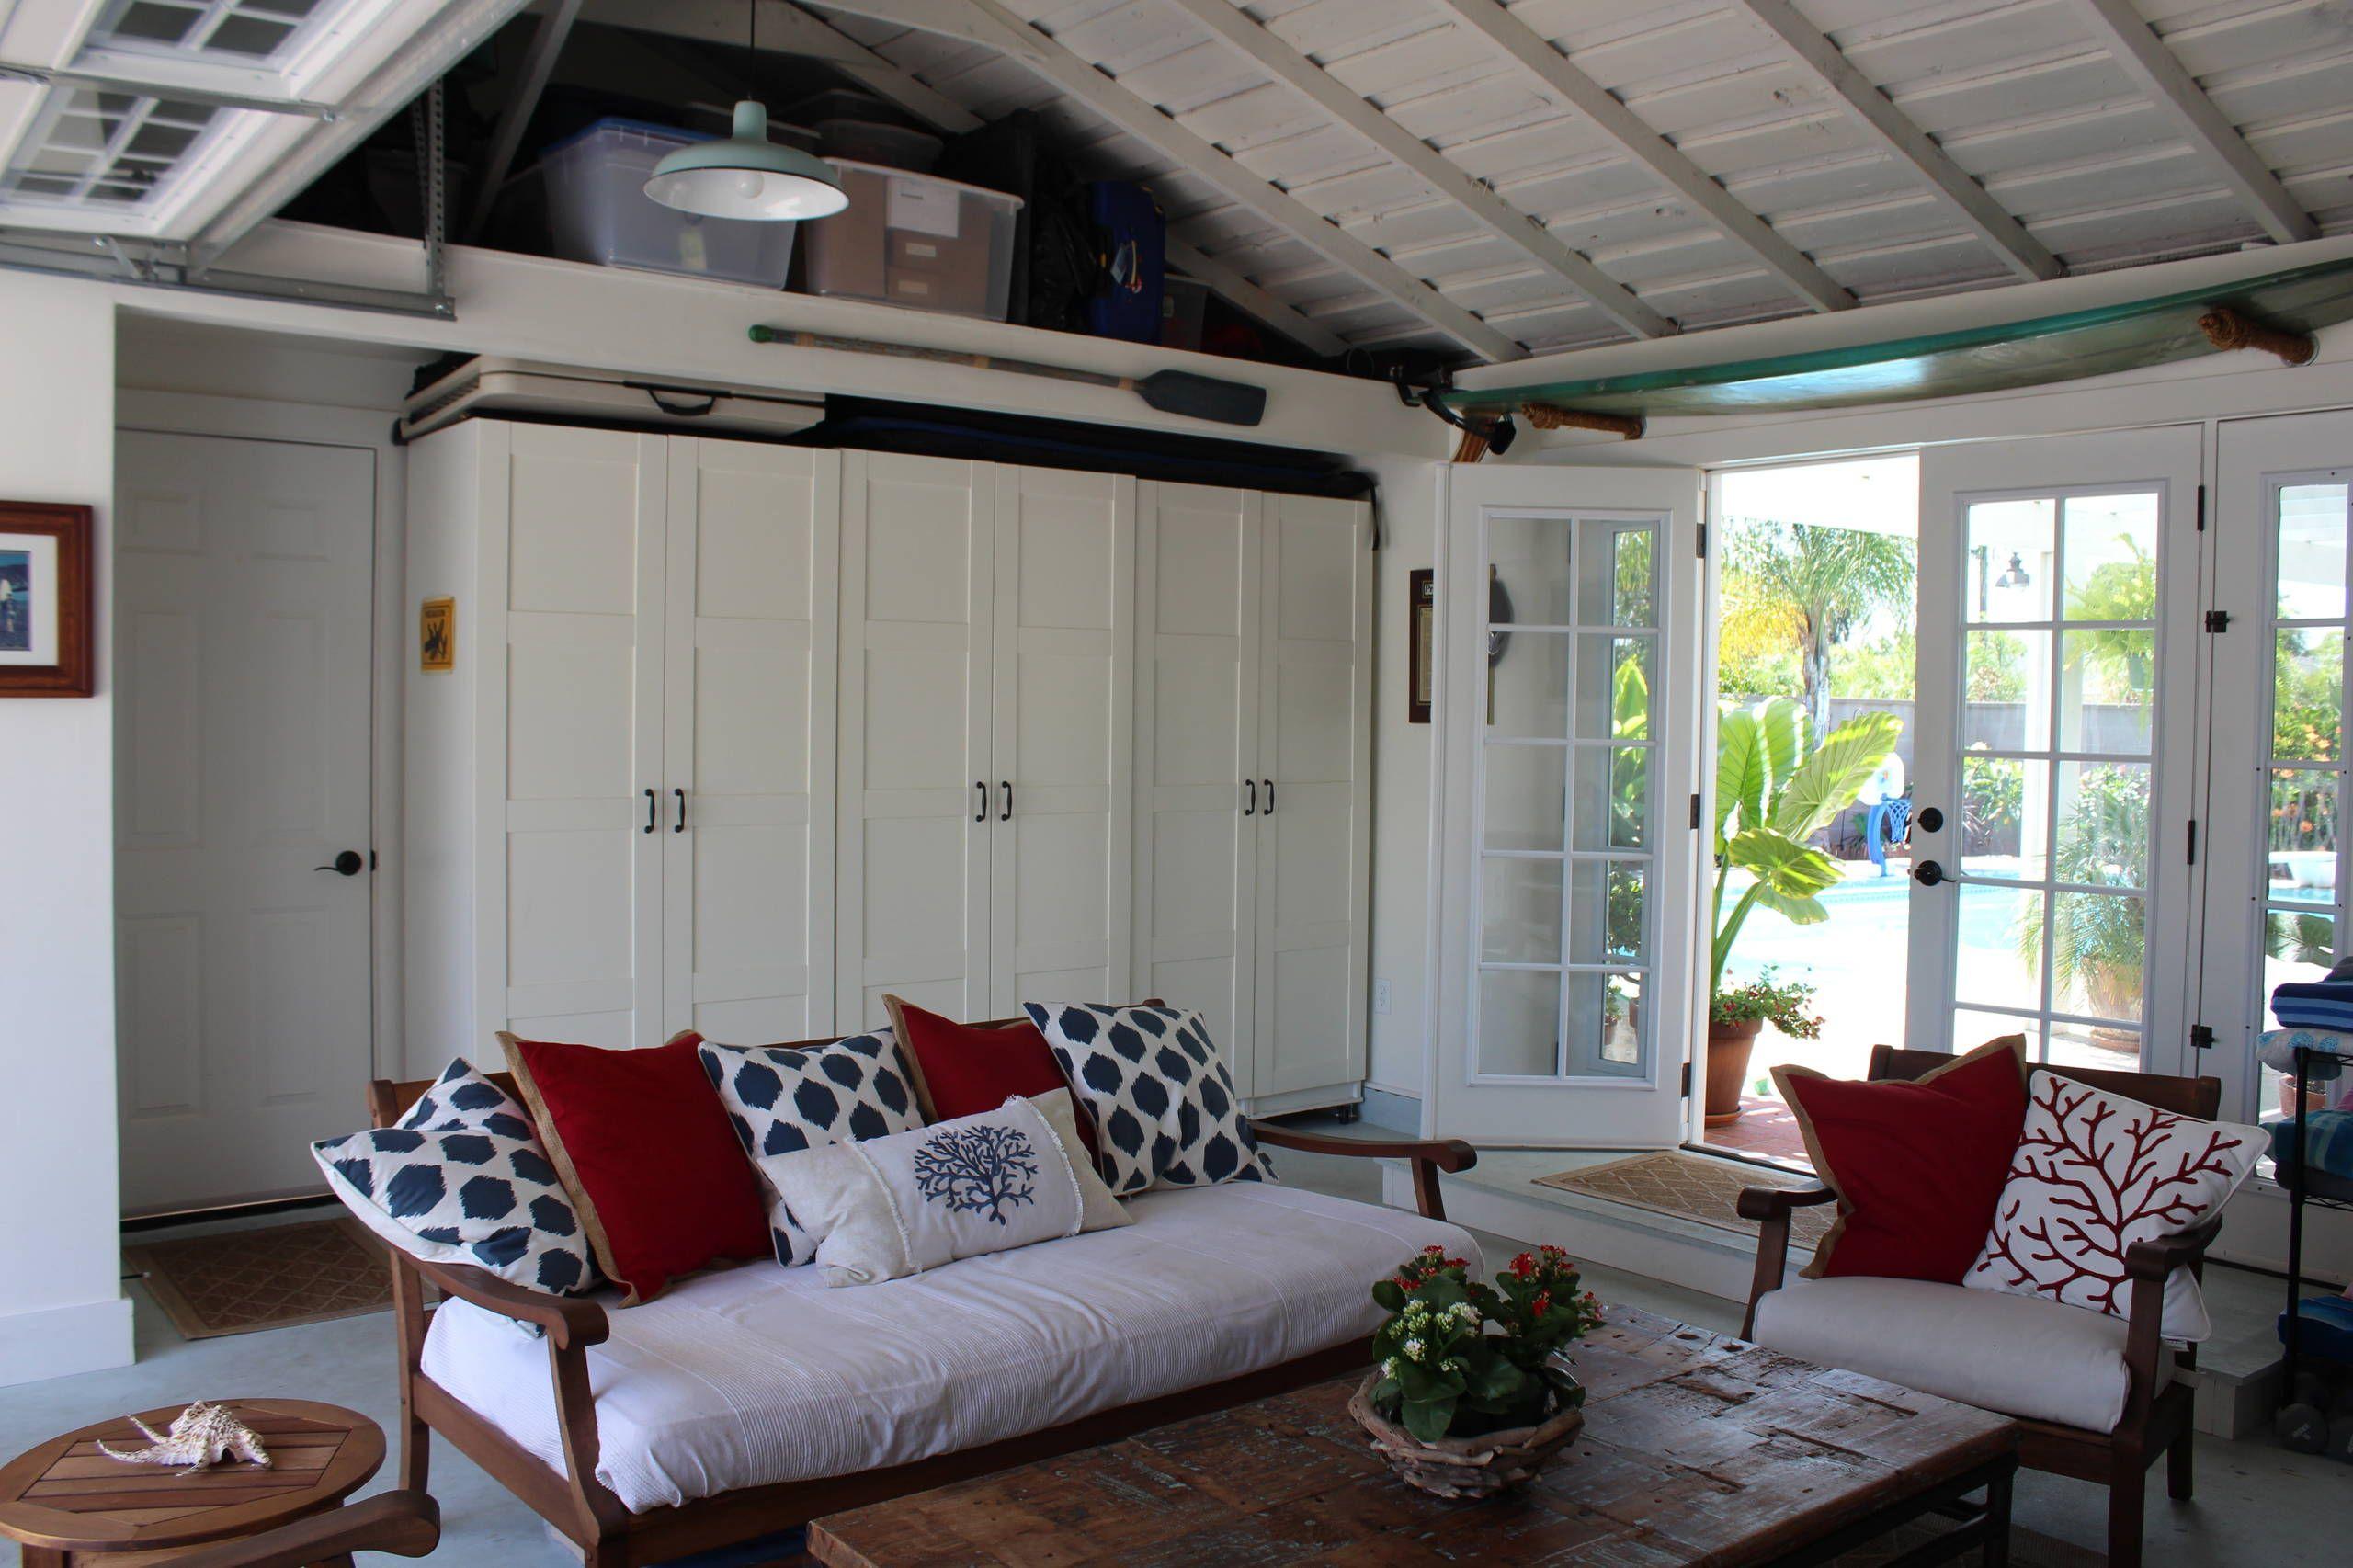 38 Stylish Shed and Garage Designs - Home Awakening ...